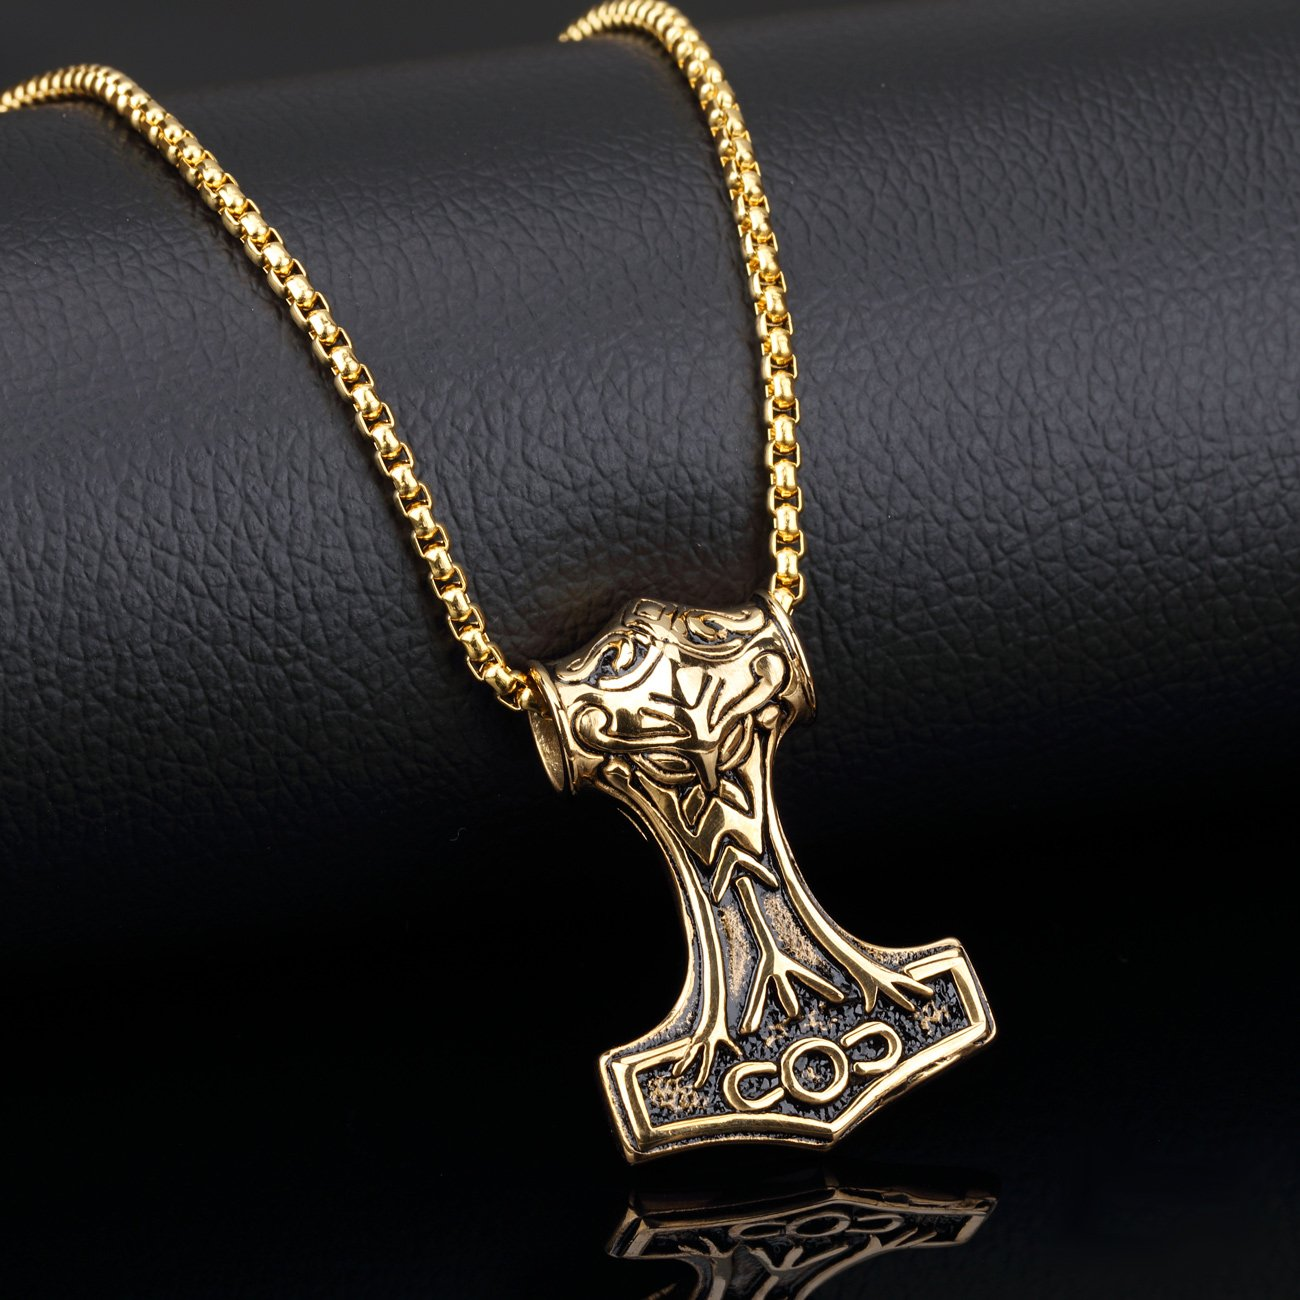 PAURO Hommes Acier Inoxydable Acier Pendentif Collier Bijoux Viking Or//Argent